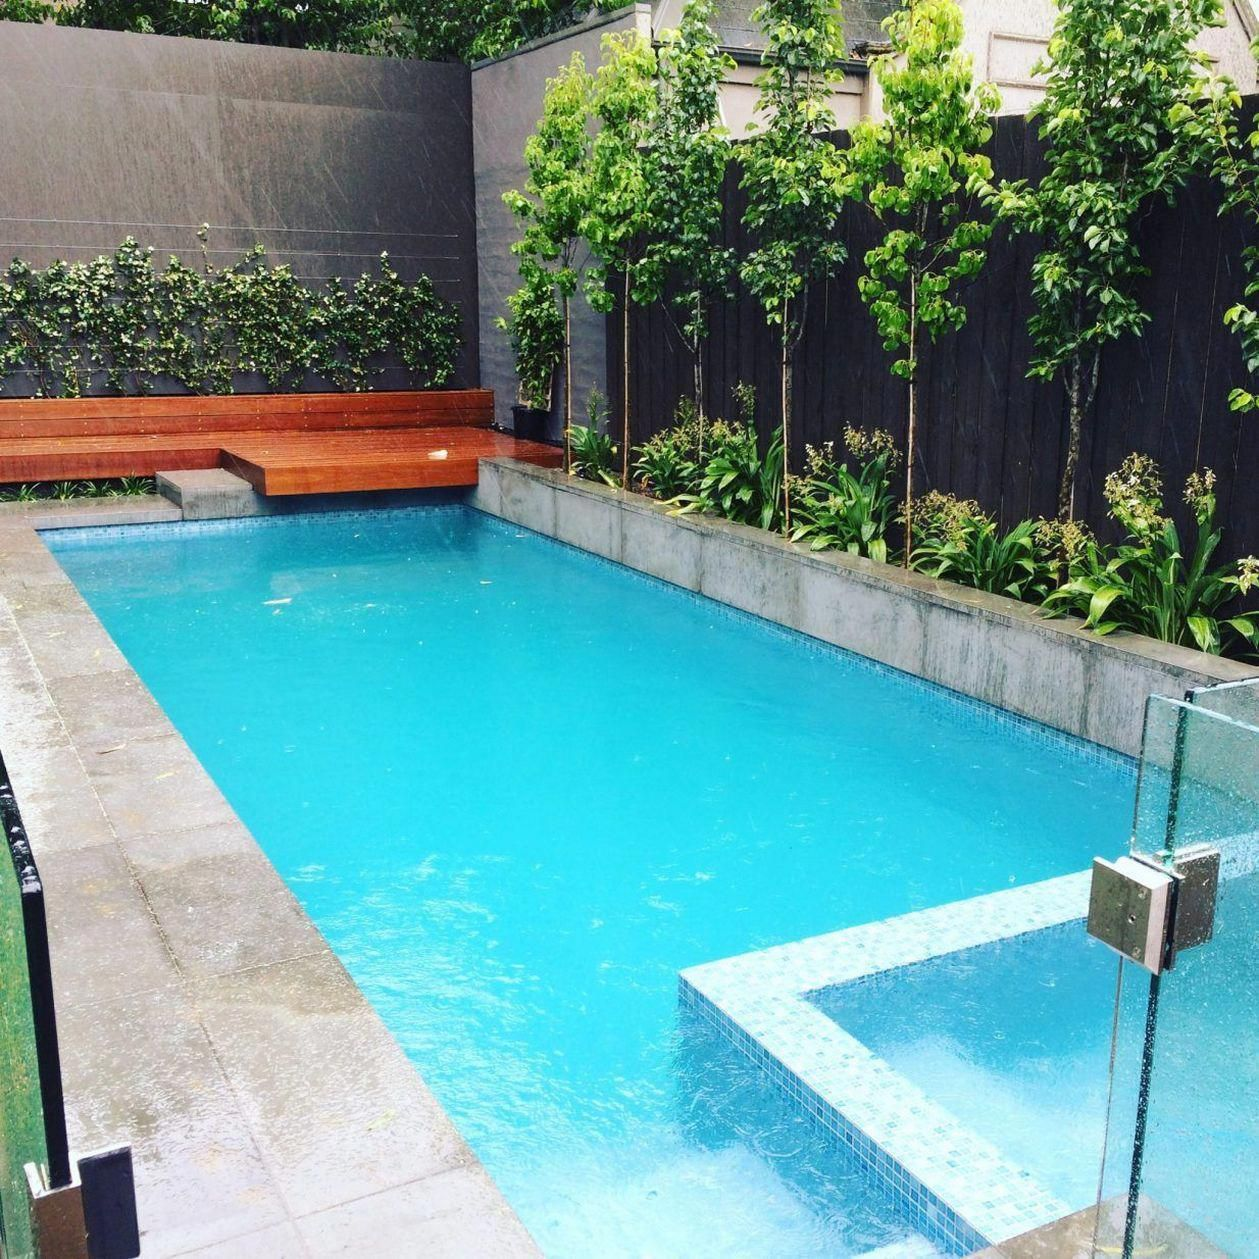 10 Rsj Pool Ideas Pool Landscaping Backyard Pool Landscaping Backyard Pool